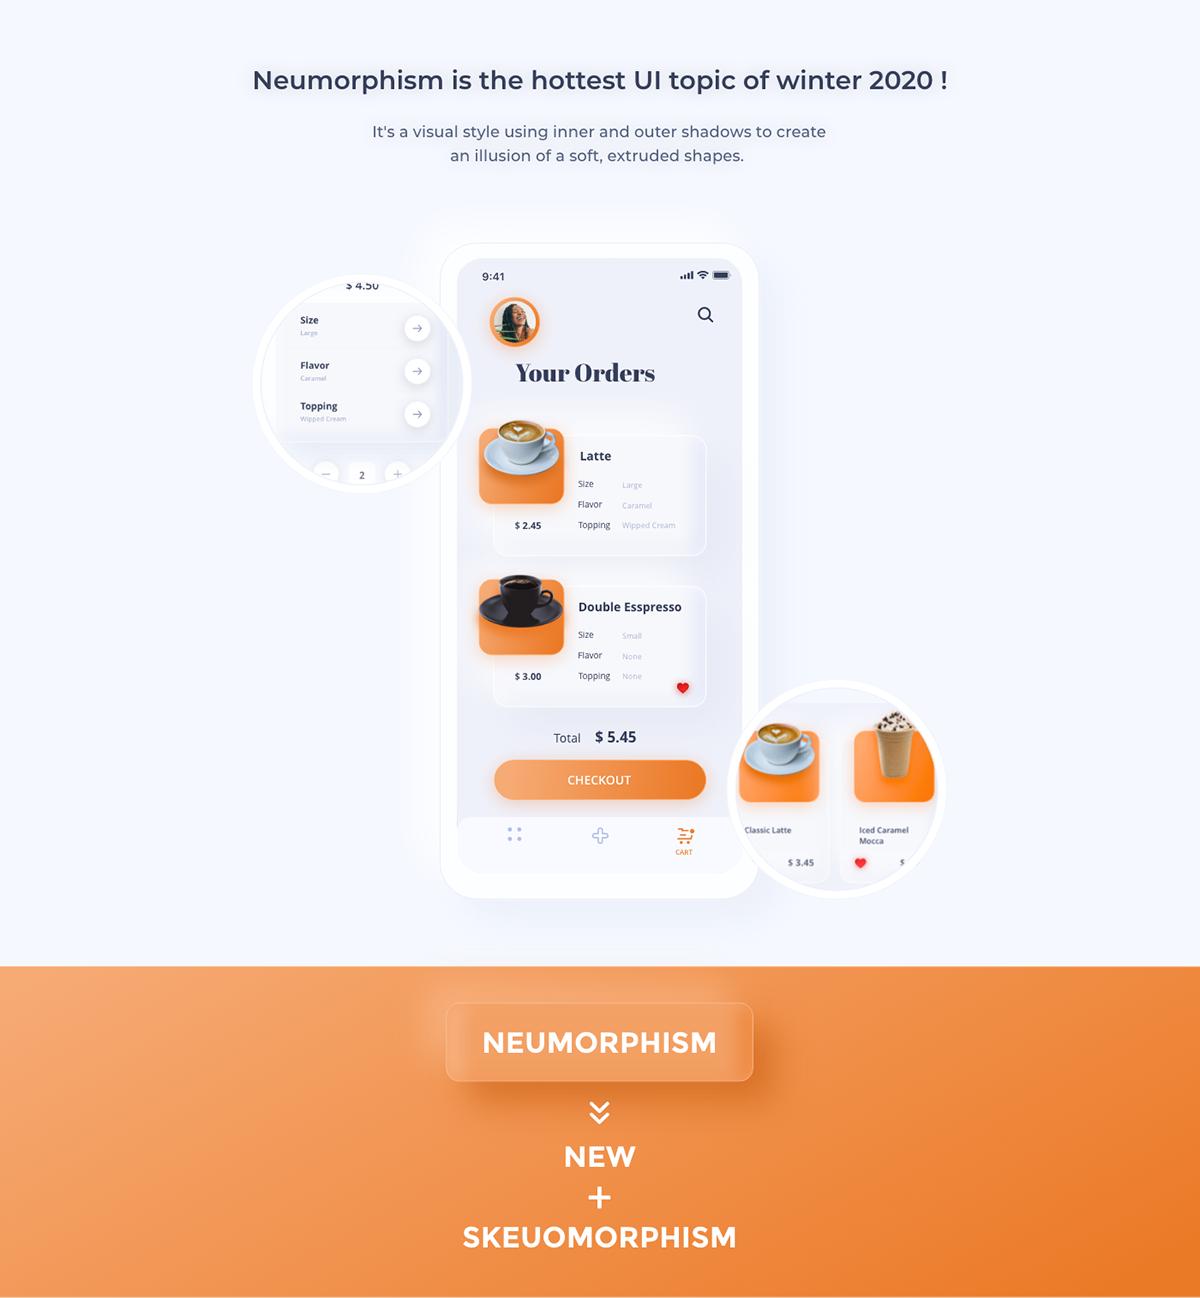 app design cofee app neomorphic app neomorphism neumorphic neumorphic app neumorphic free neumorphic xd neumorphism neumorphism xd